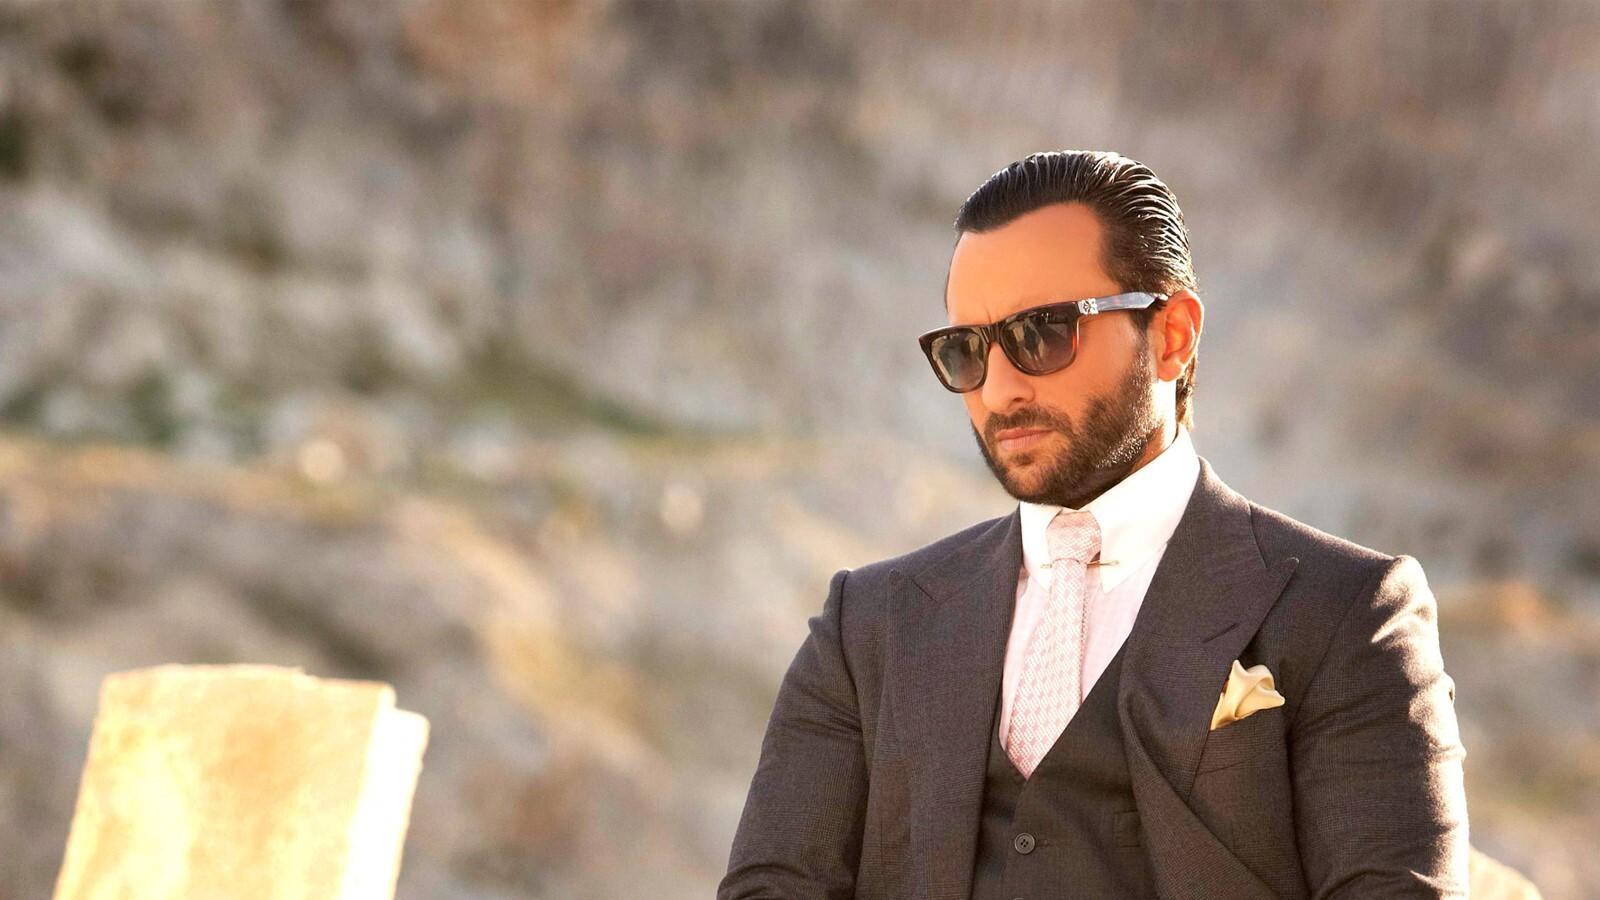 Wallpaper download bollywood actors - Saif Ali Khan Wallpapers